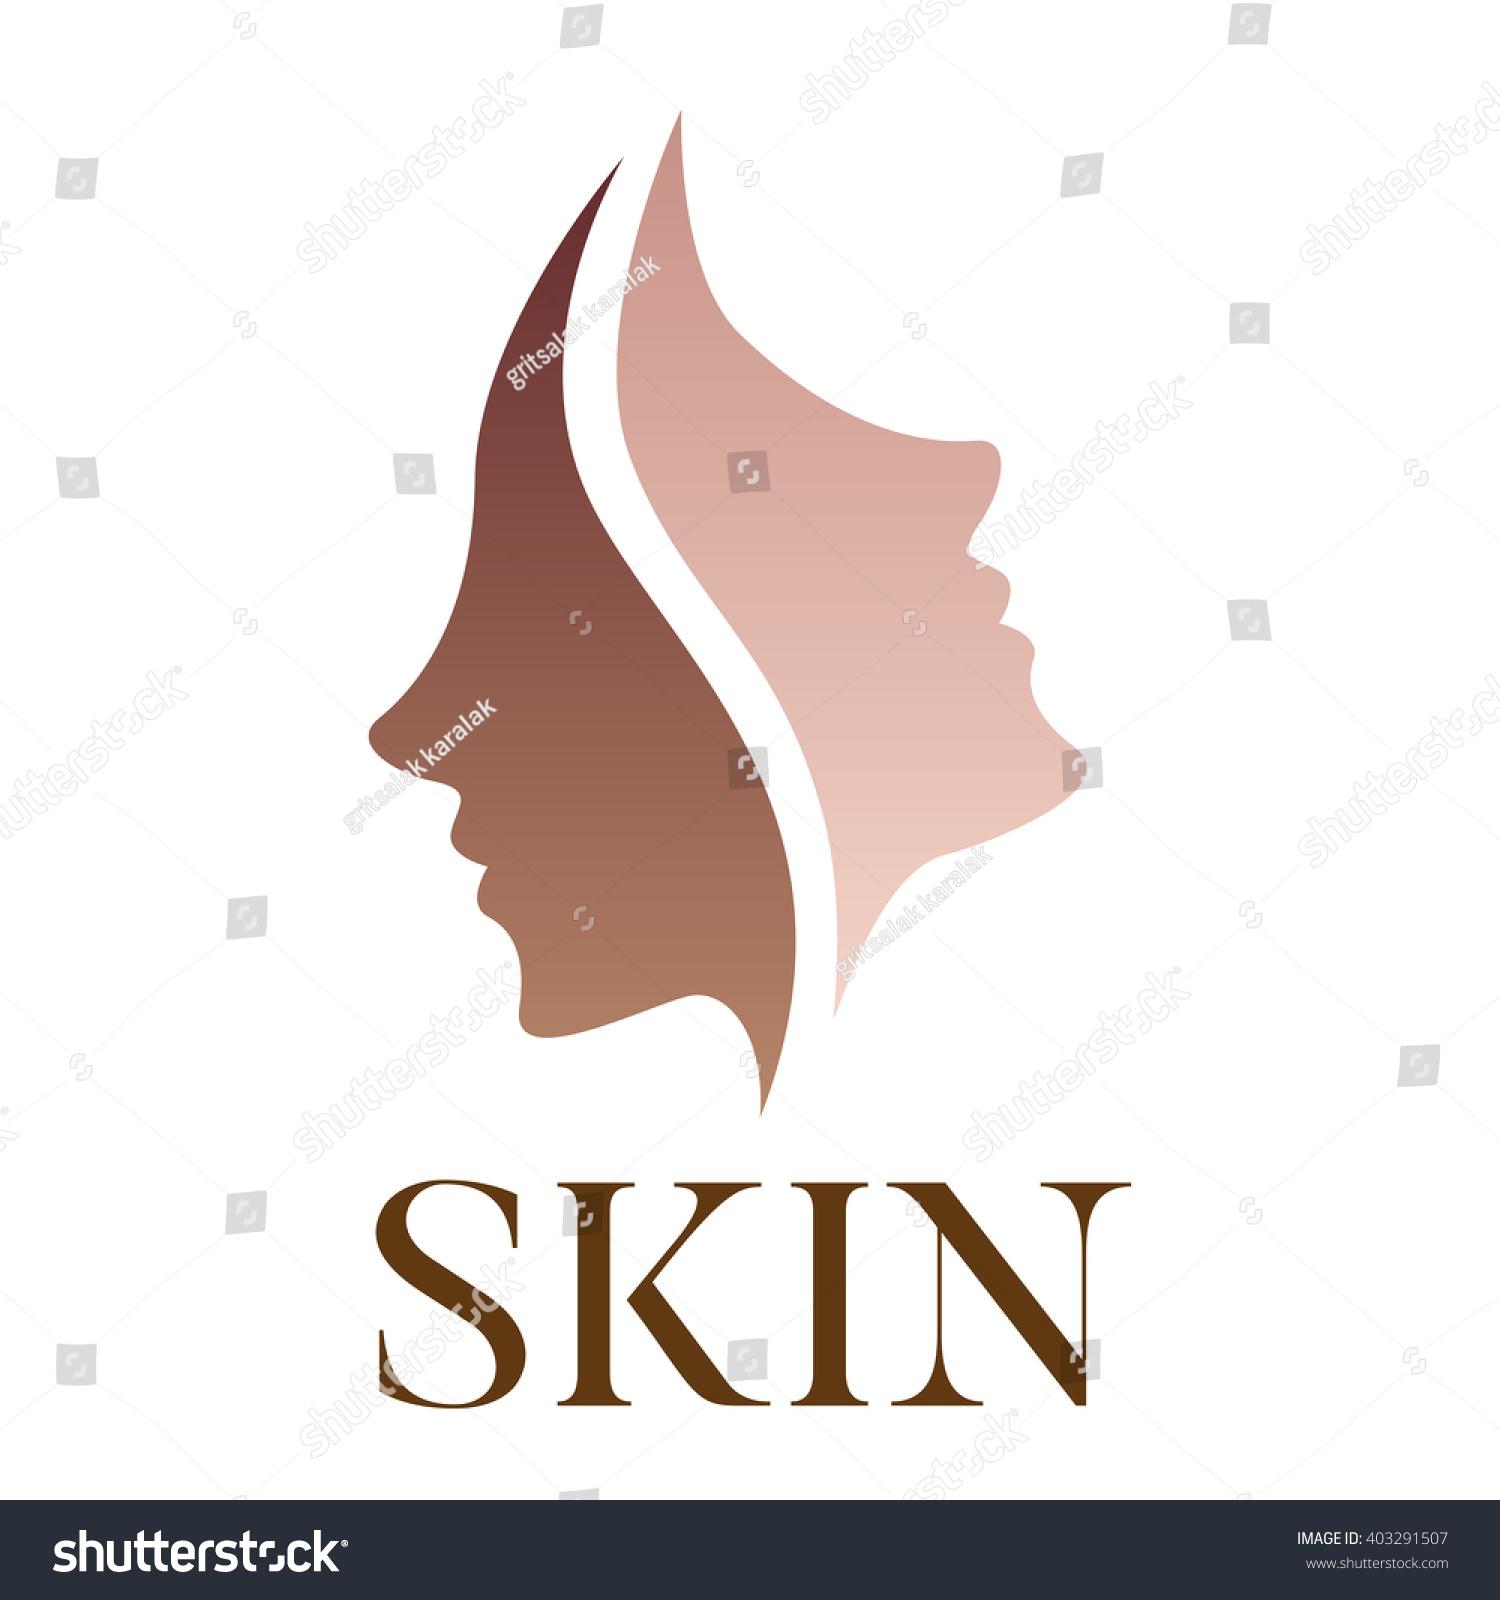 skin vector icon logo dark turn stock vector 403291507 beauty salon logo design ideas beauty salon logo design pics